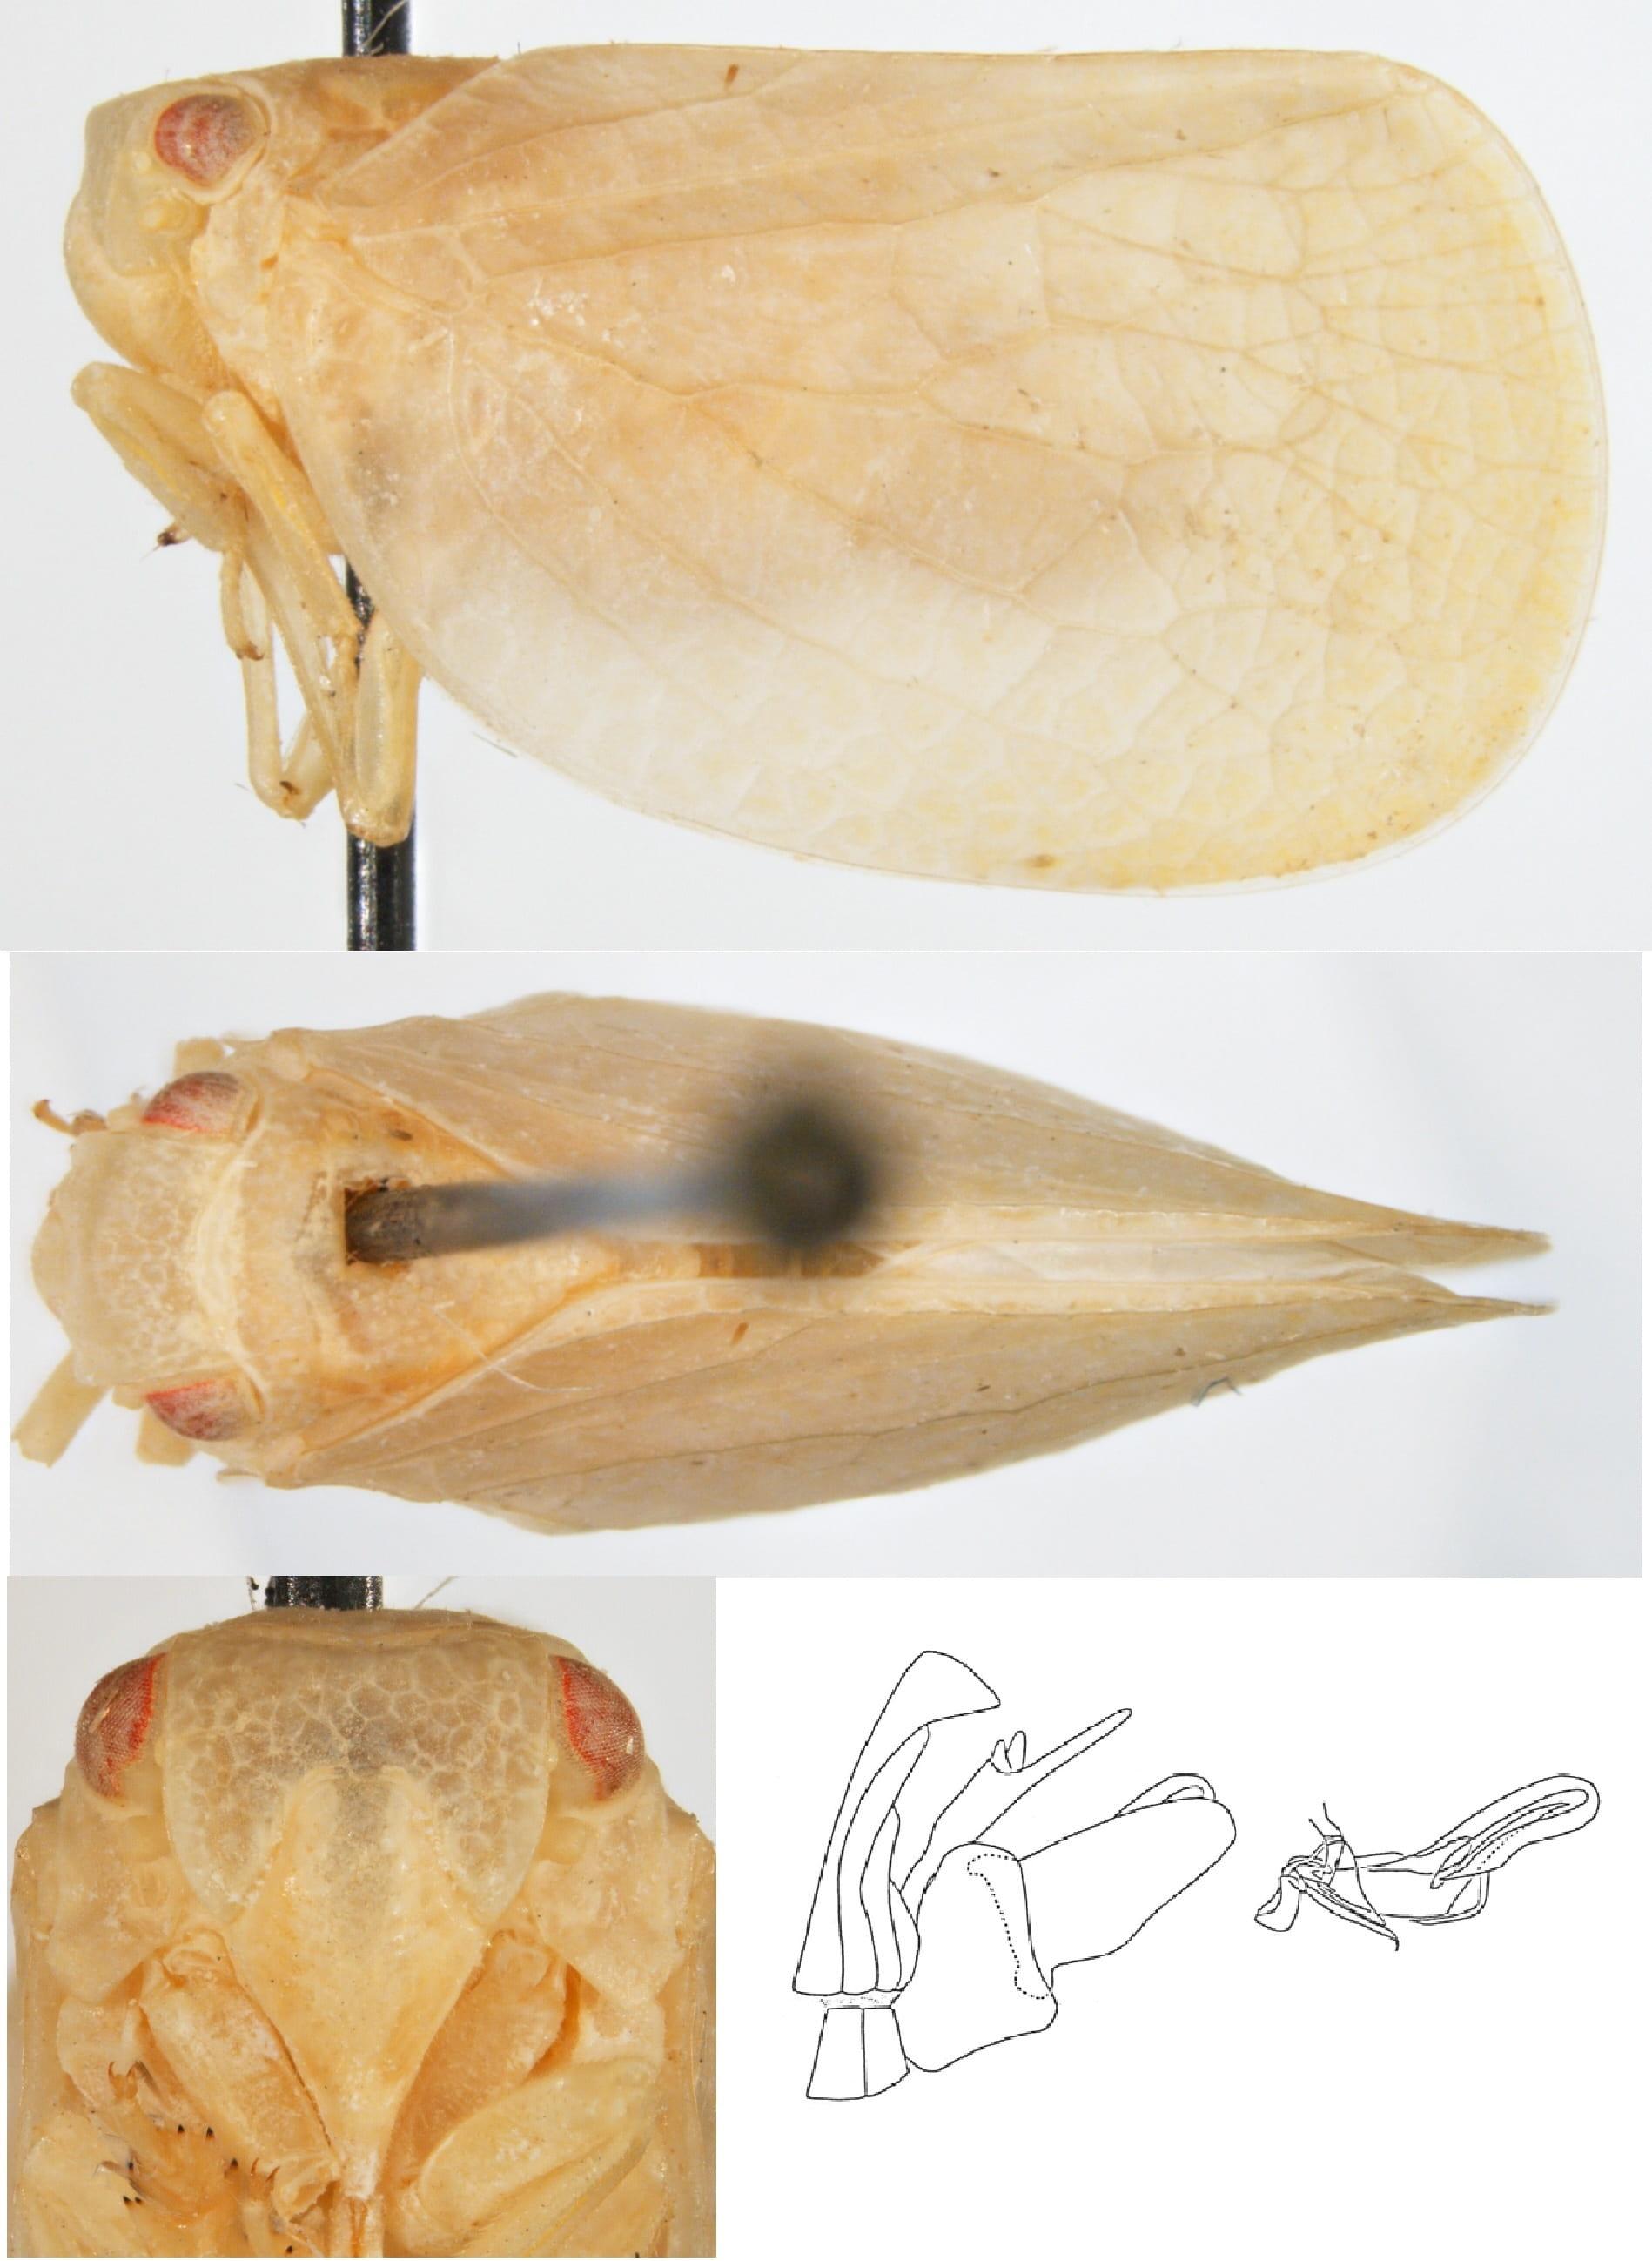 Acanalonia grandicella